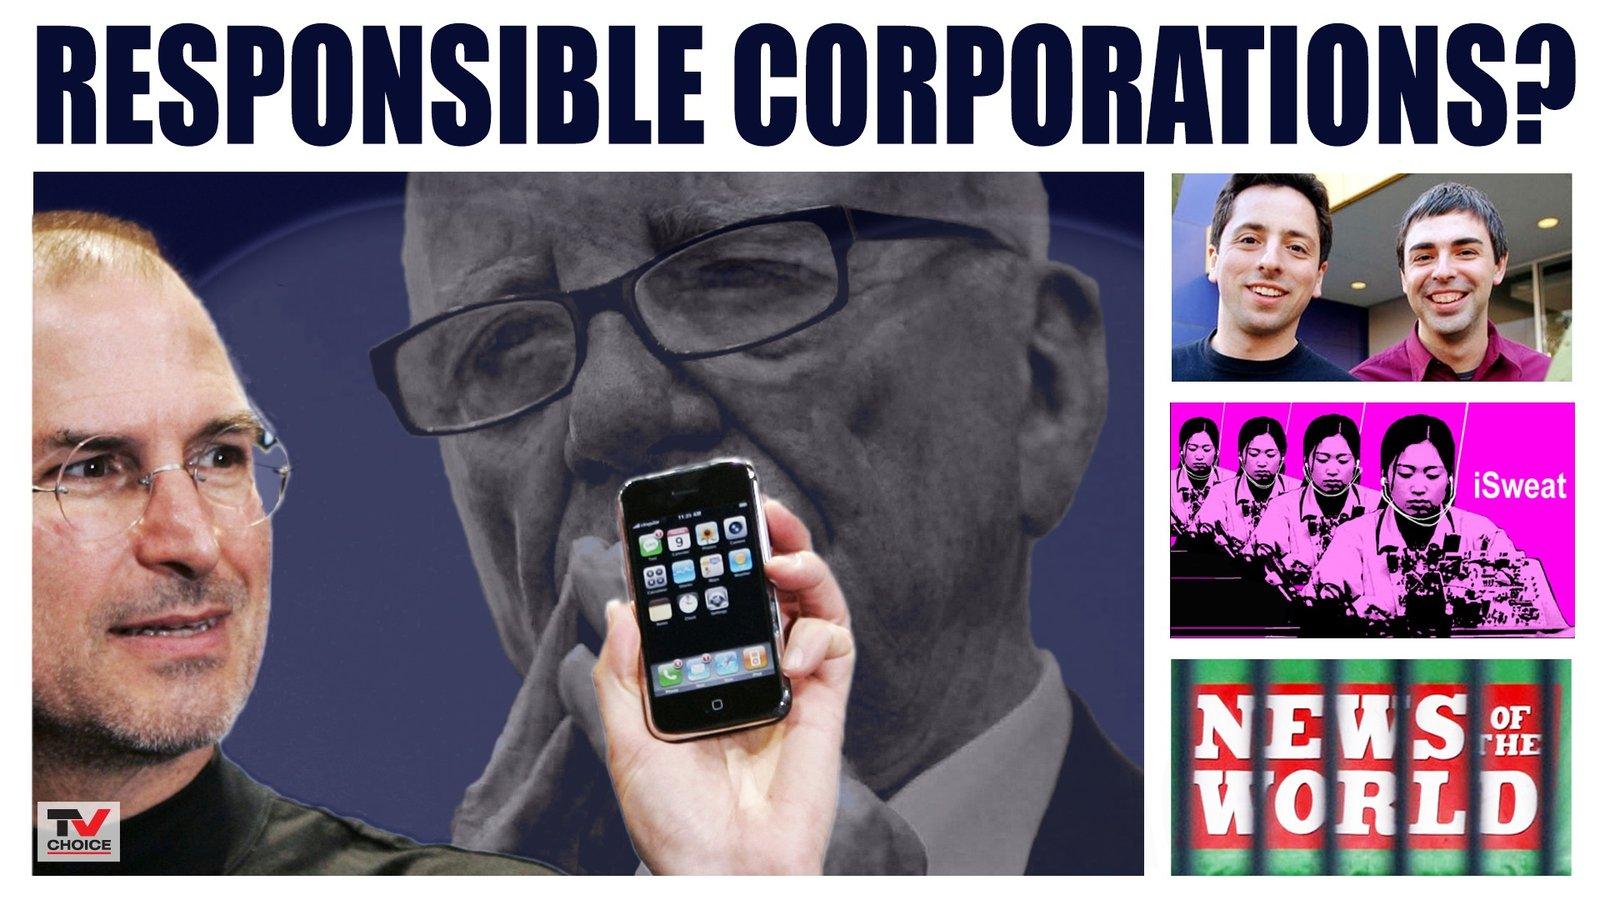 Responsible Corporations? Google, Apple & News Corp